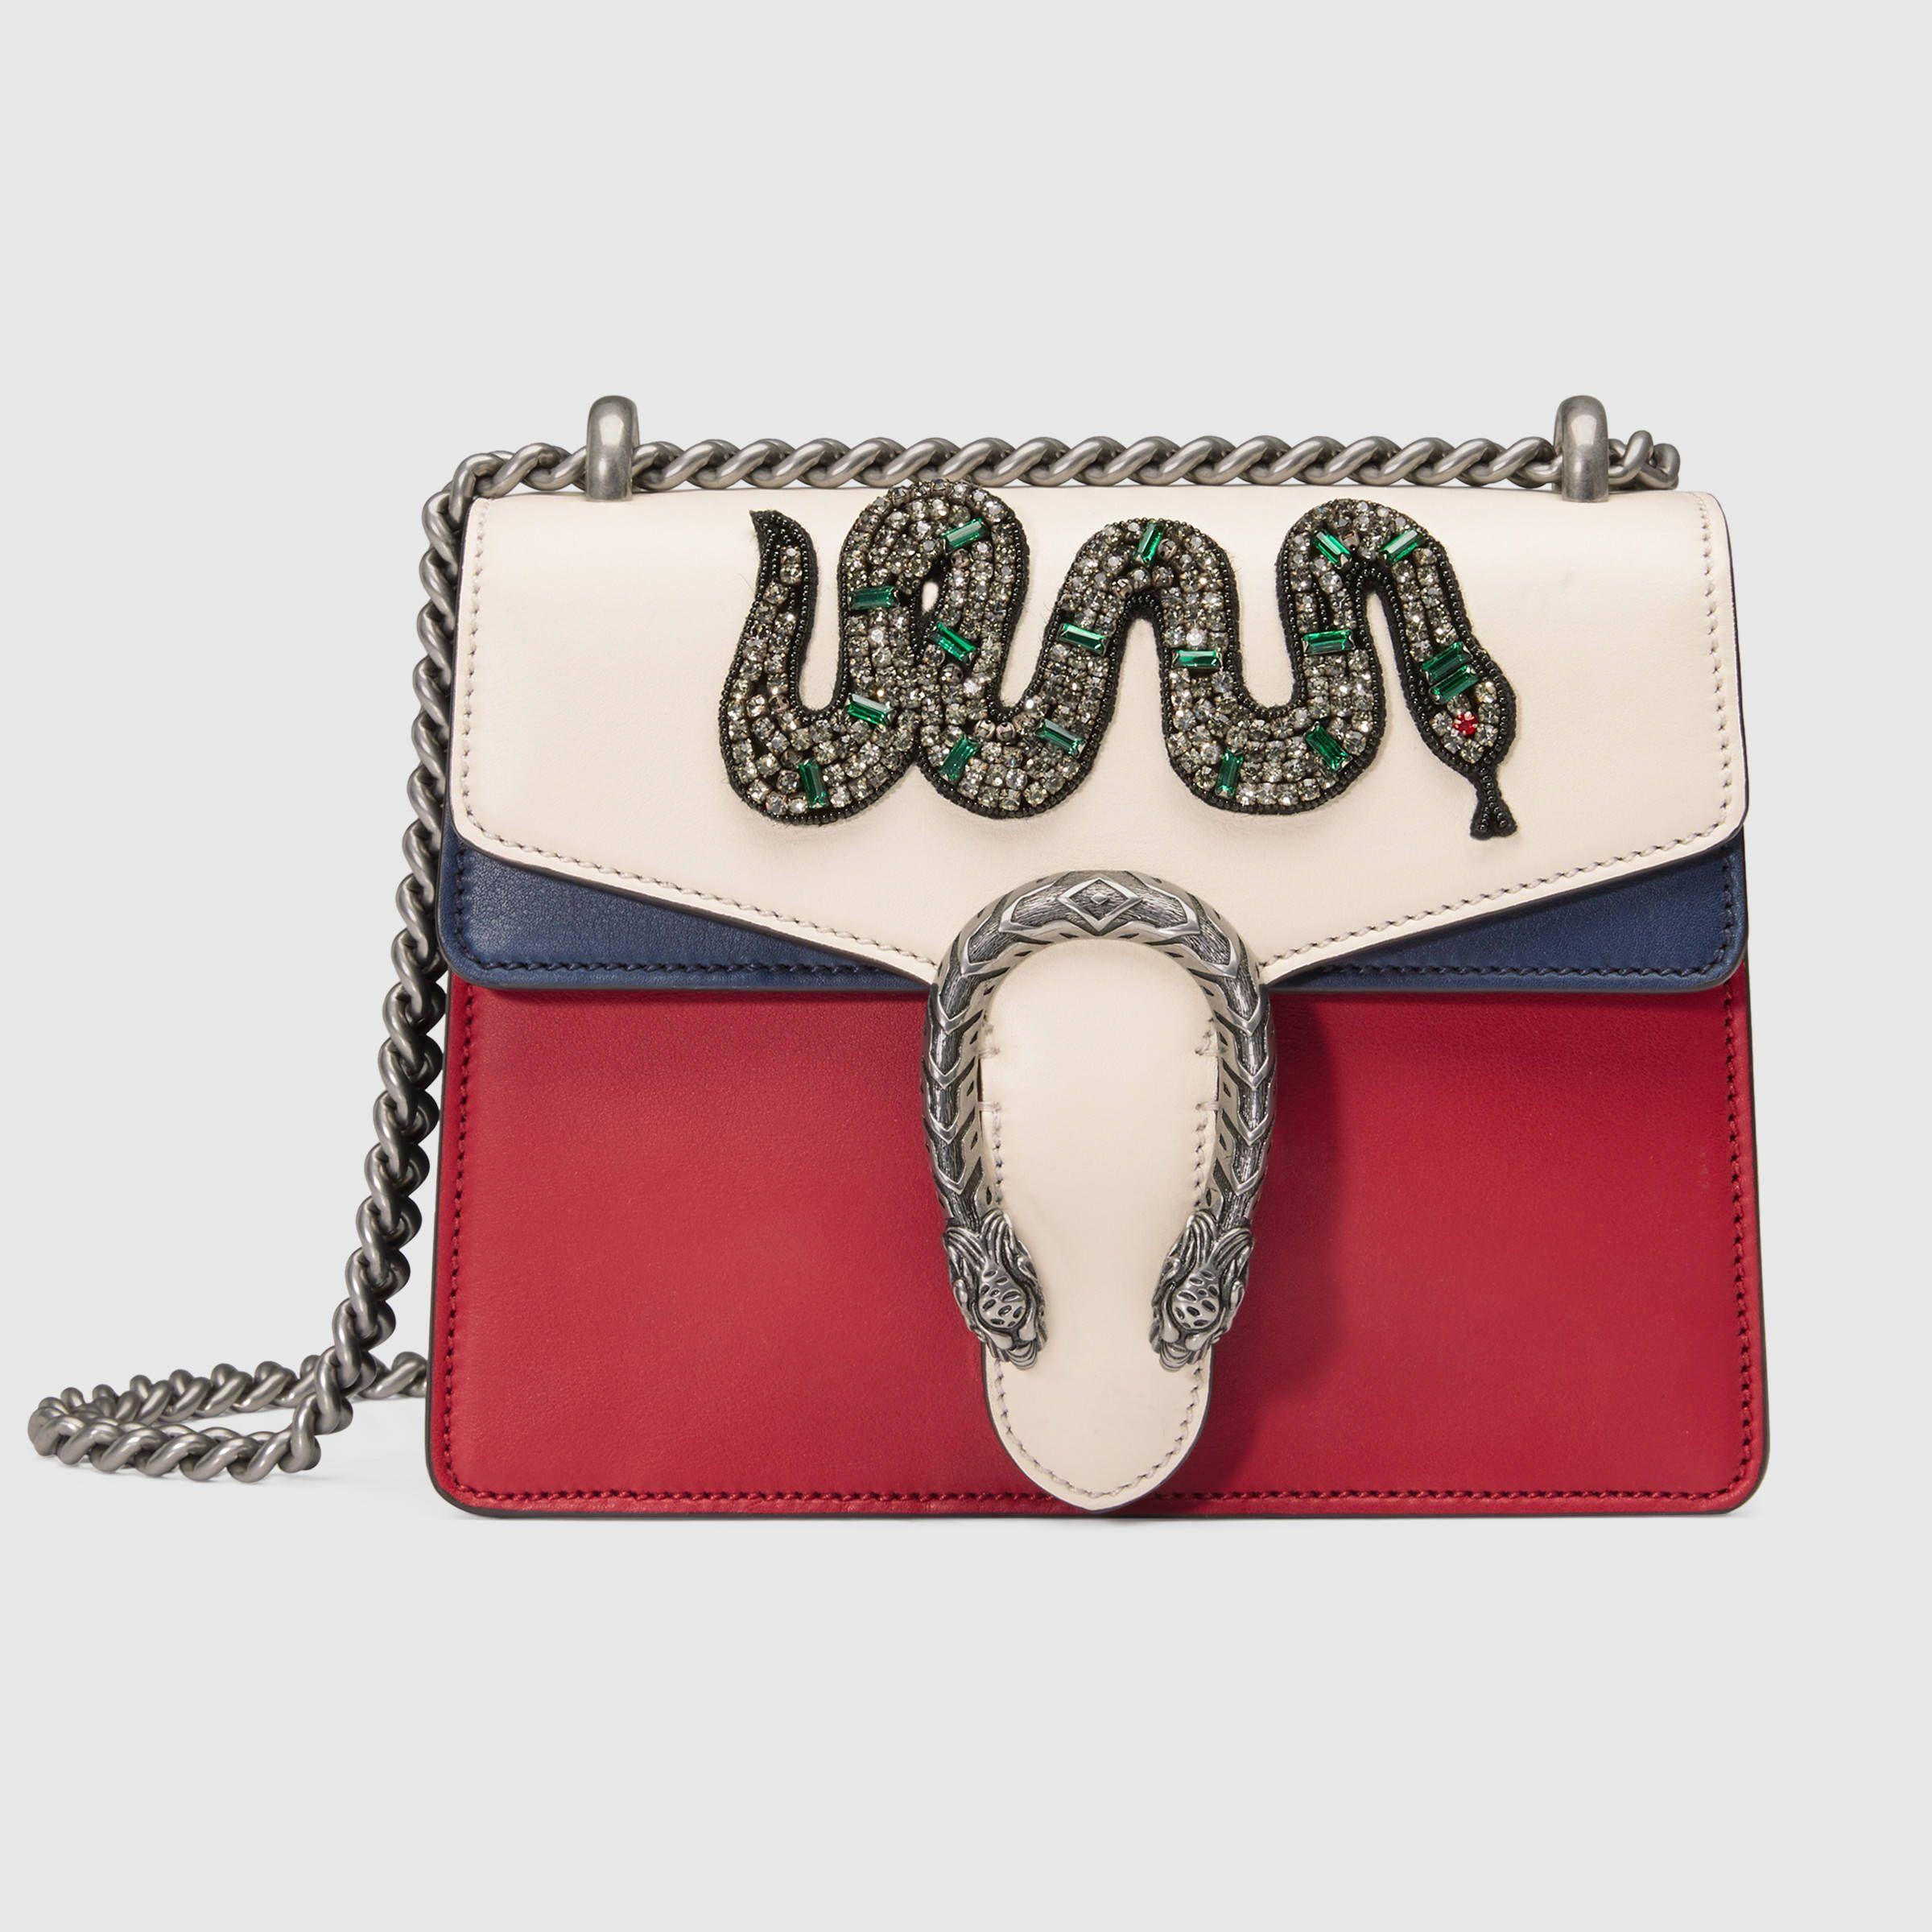 15ccd08ec8eac1 Dionysus embroidered leather mini bag   Wishlist   Gucci shoulder ...